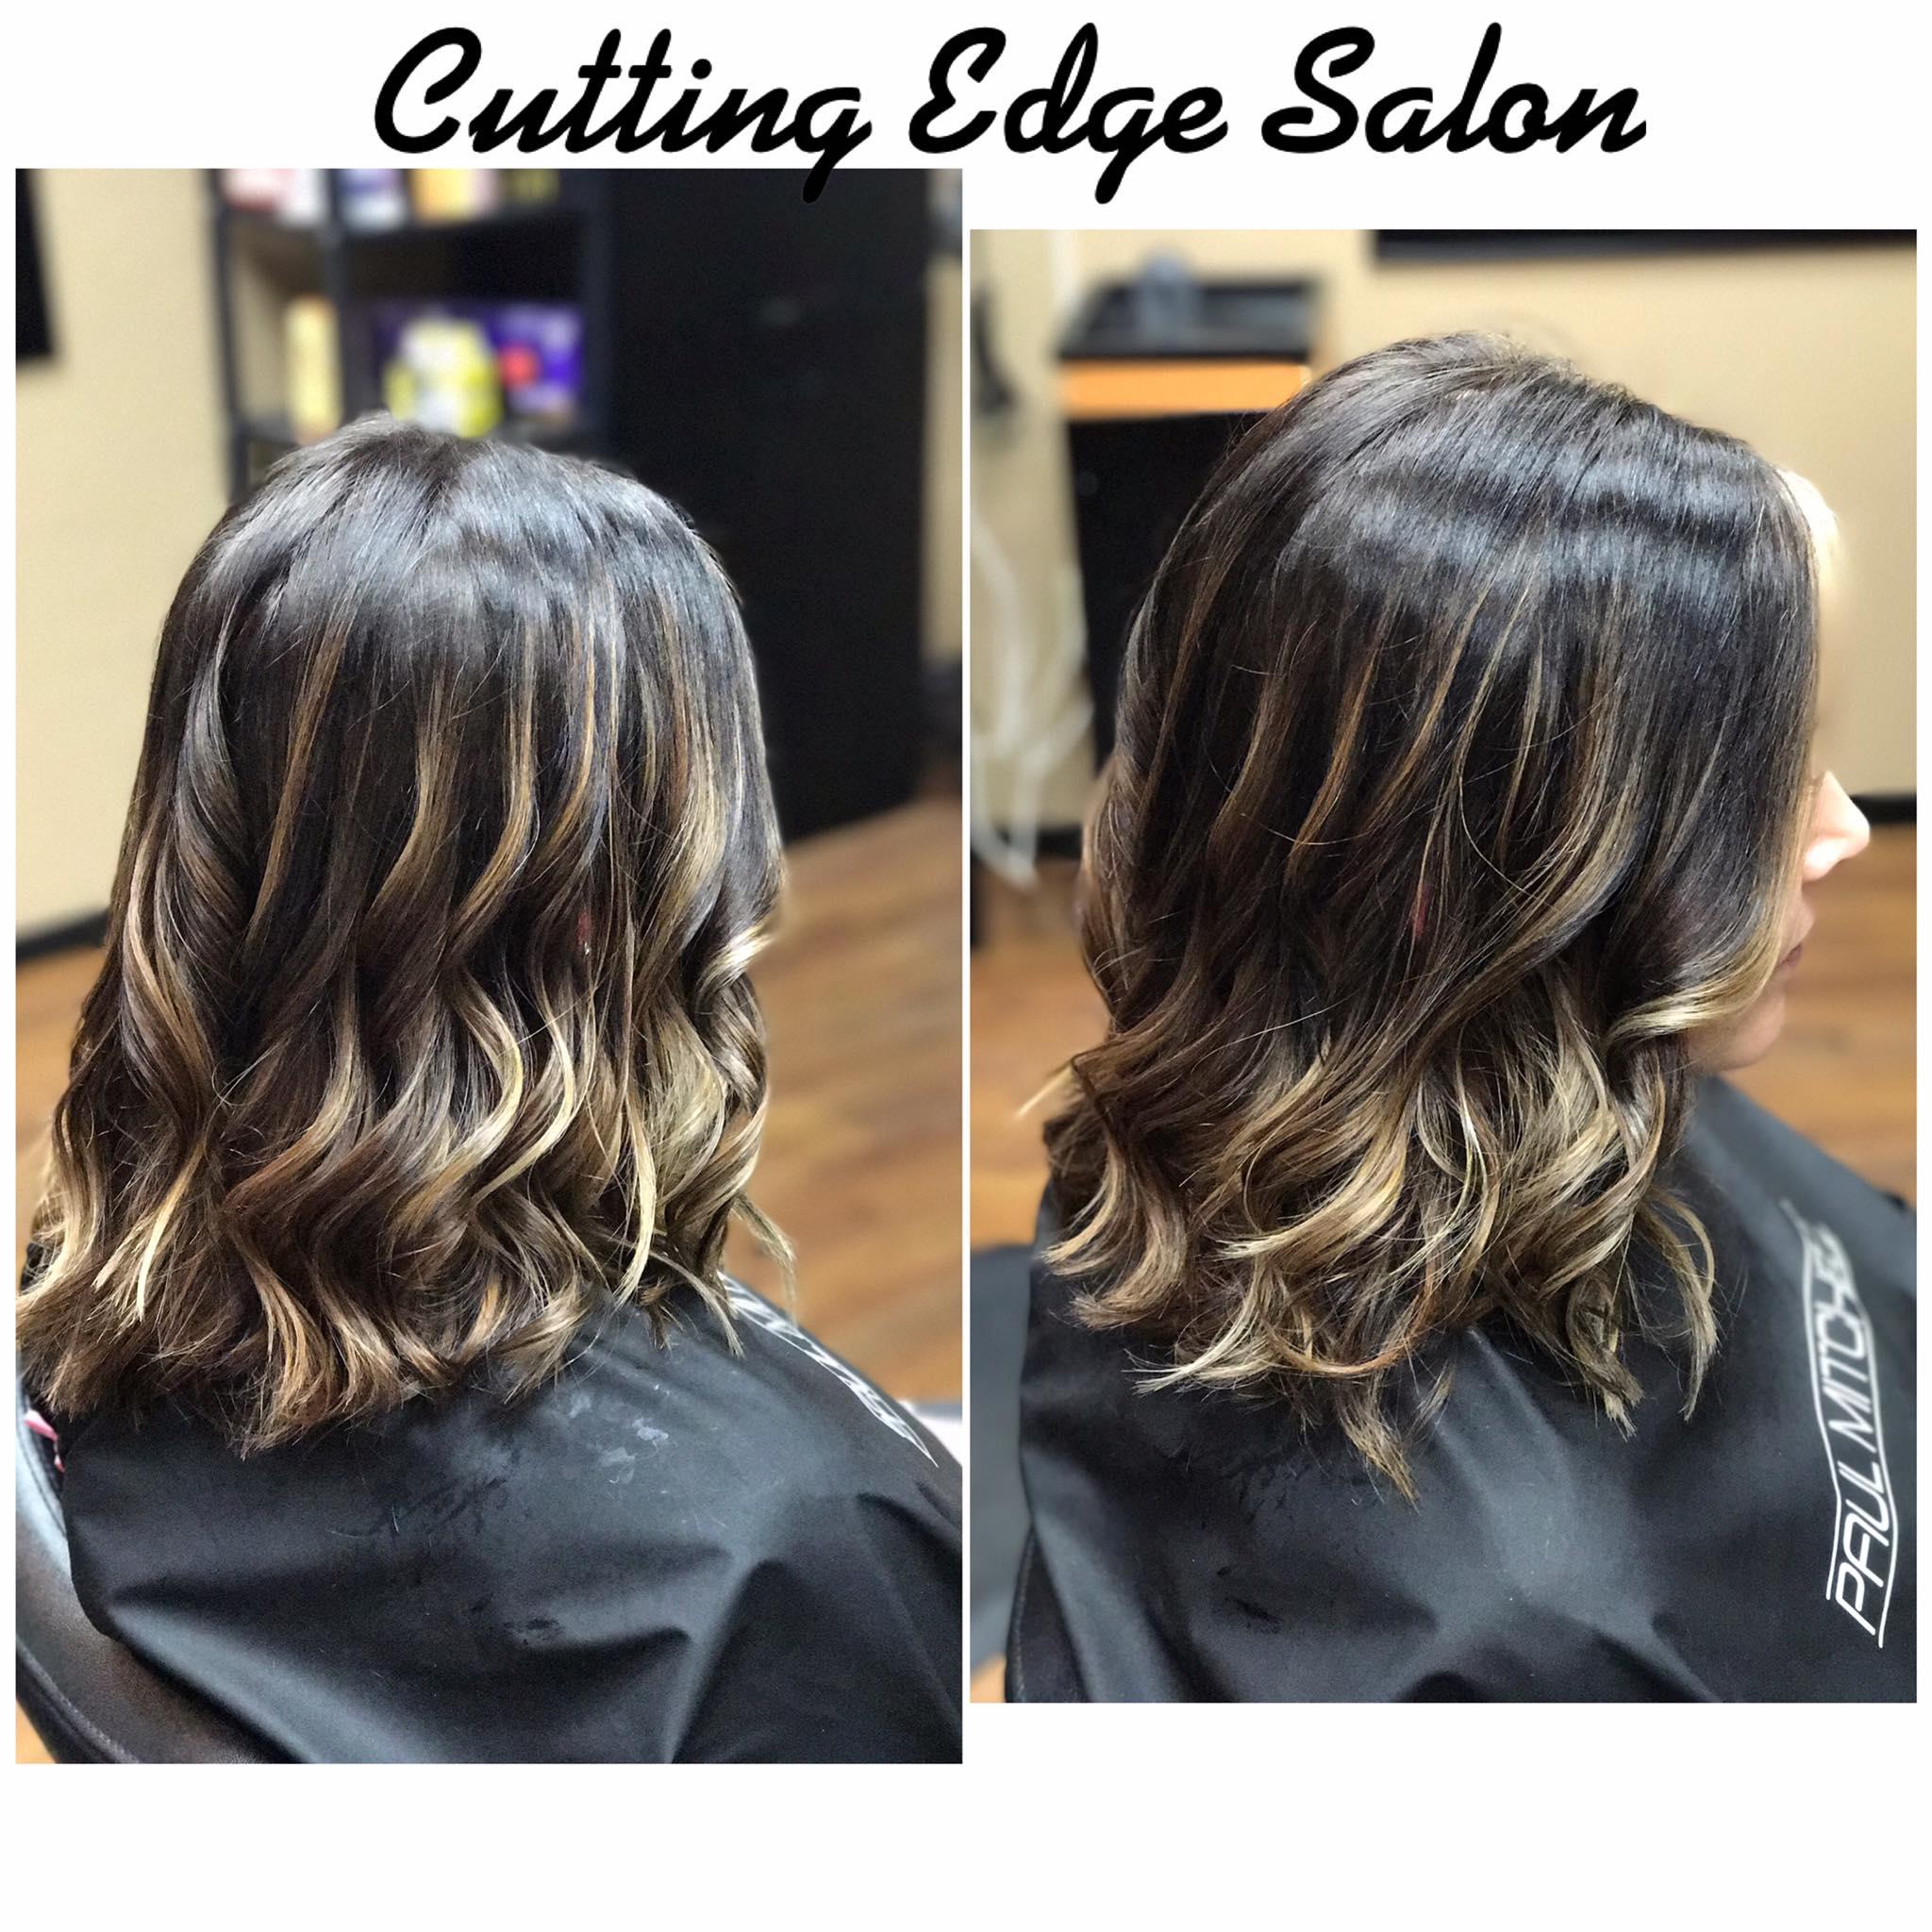 Cutting Edge Salon Foley MN hair style